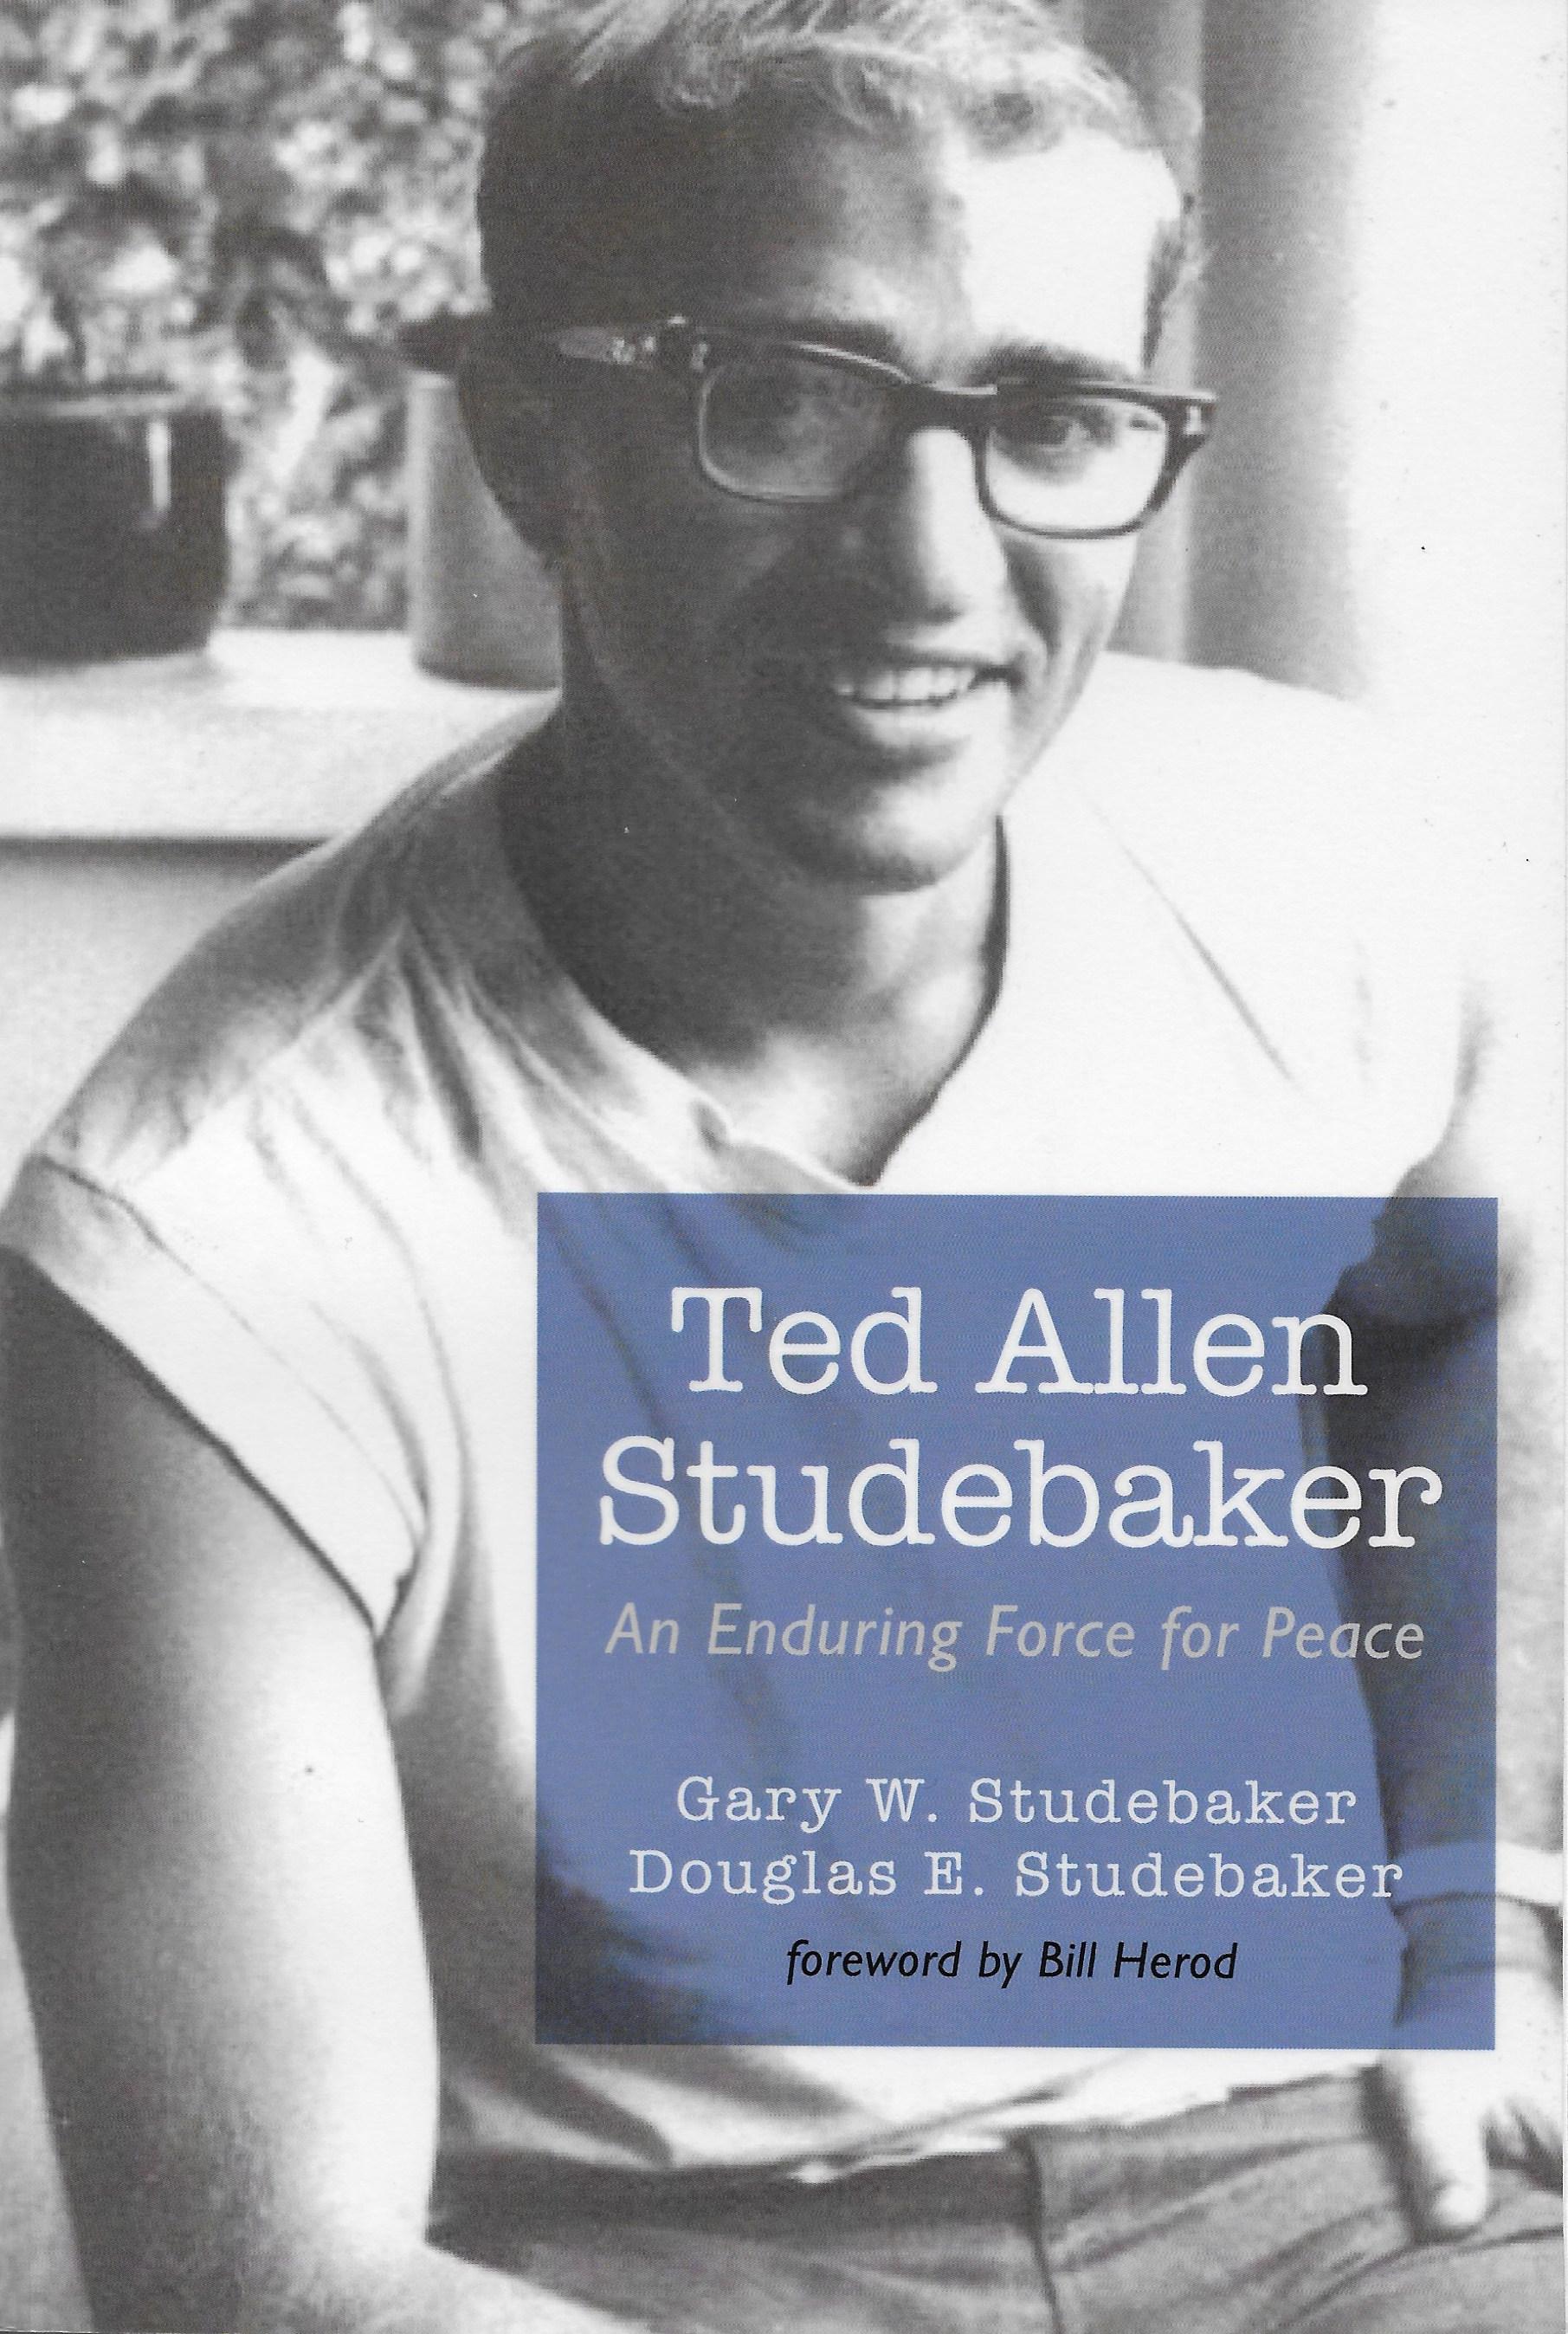 Studebaker Book Cover.jpeg